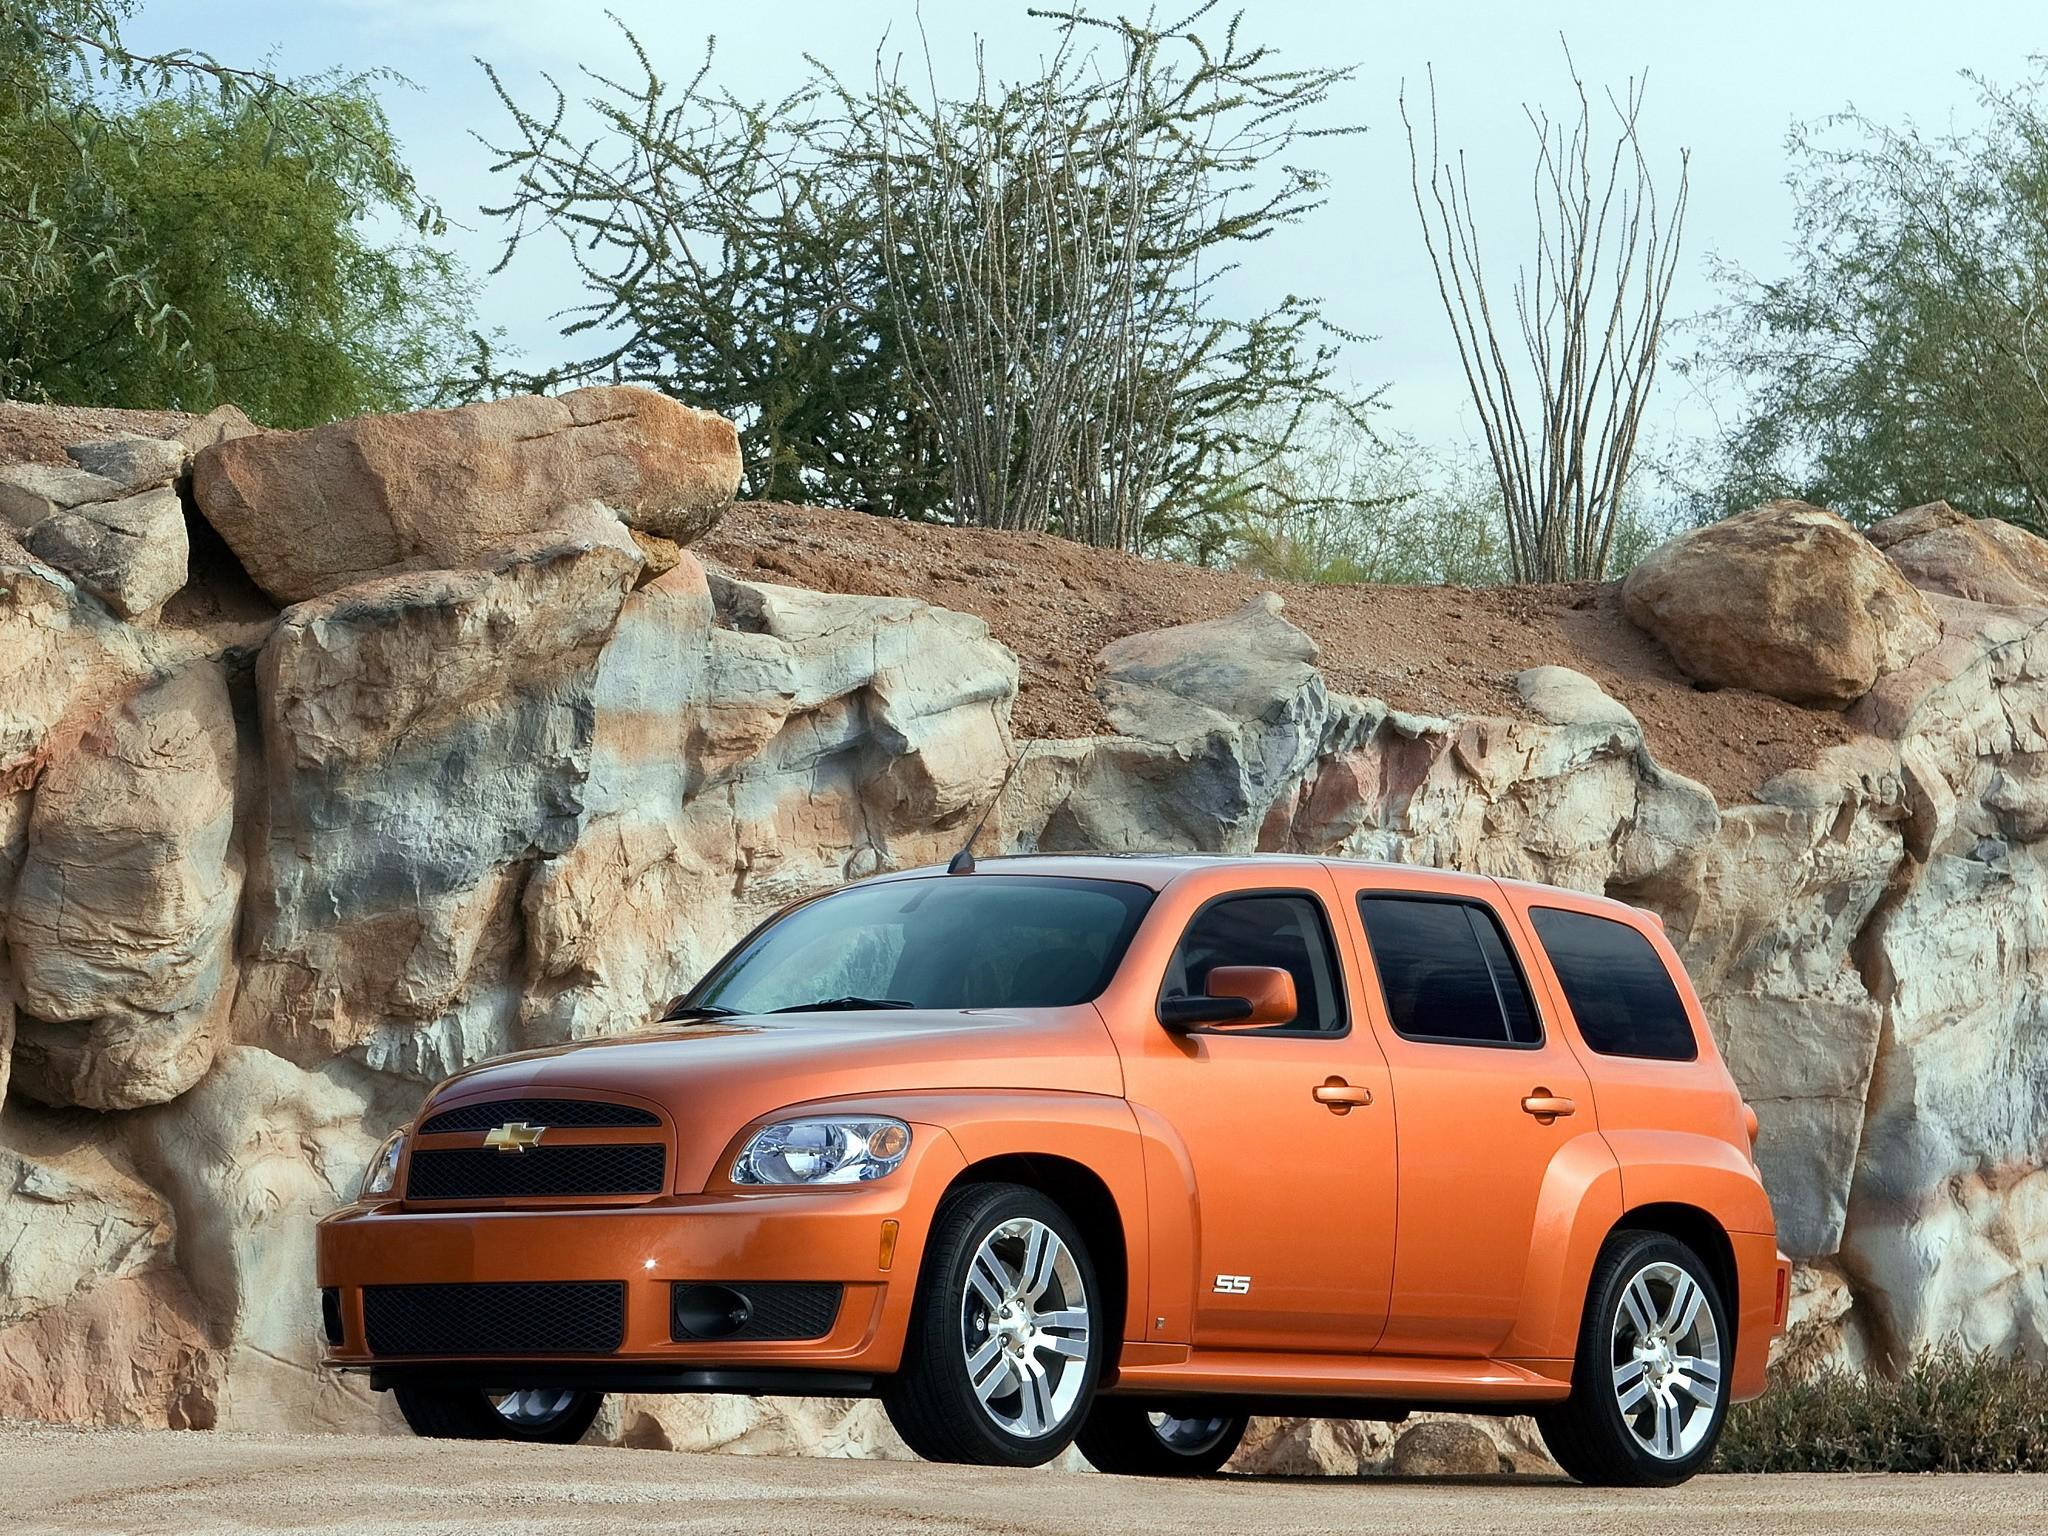 Chevrolet Hhr Ss 2007 2008 2009 2010 2011